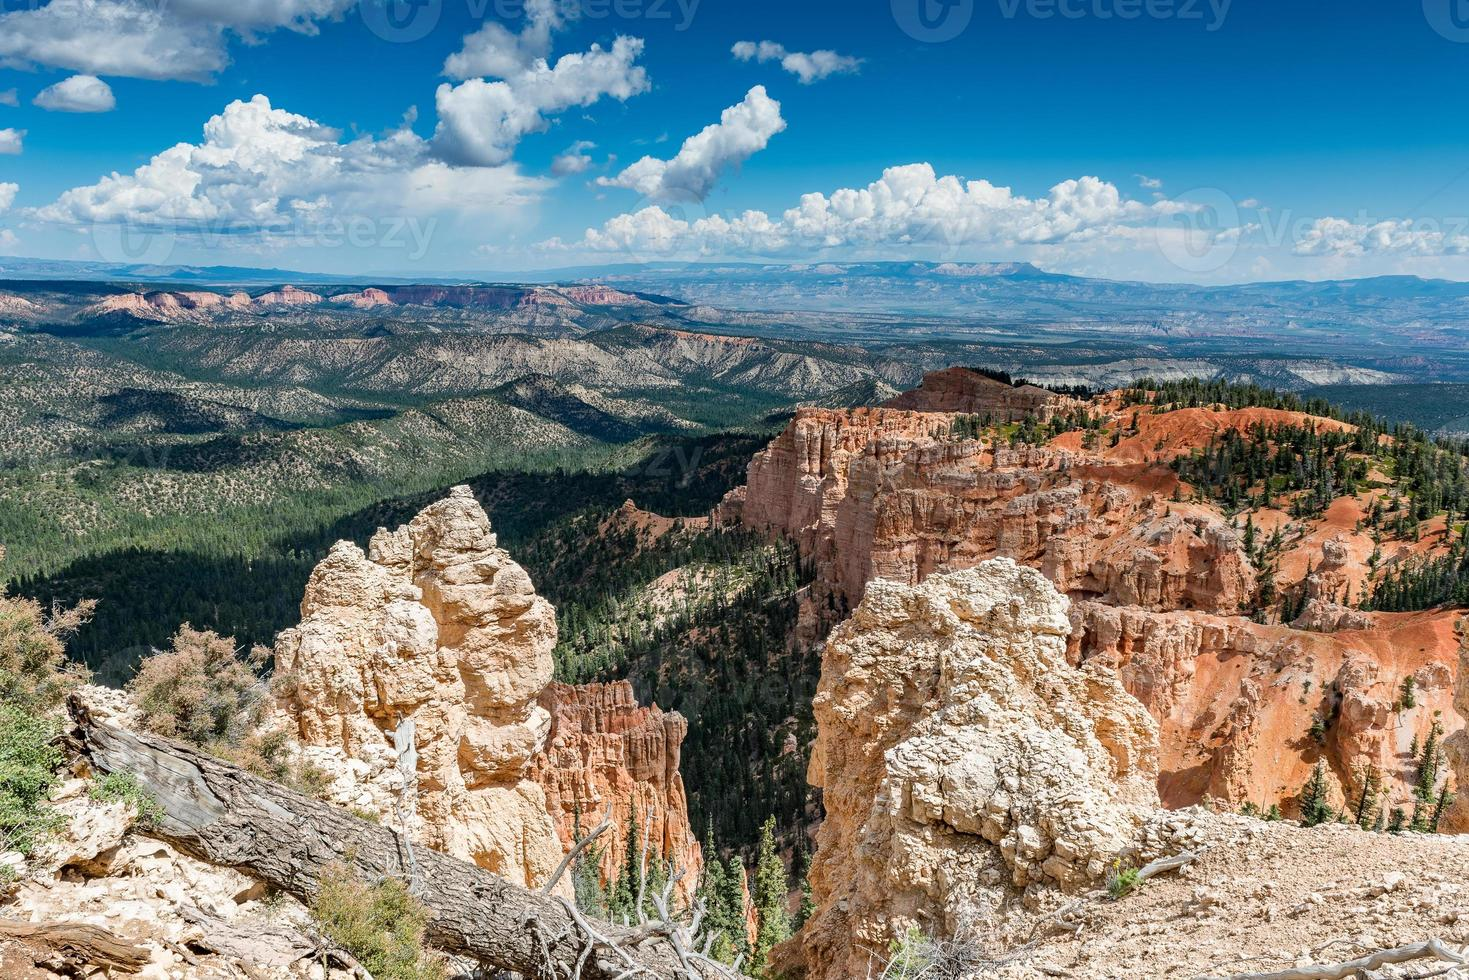 paisagem rochosa foto